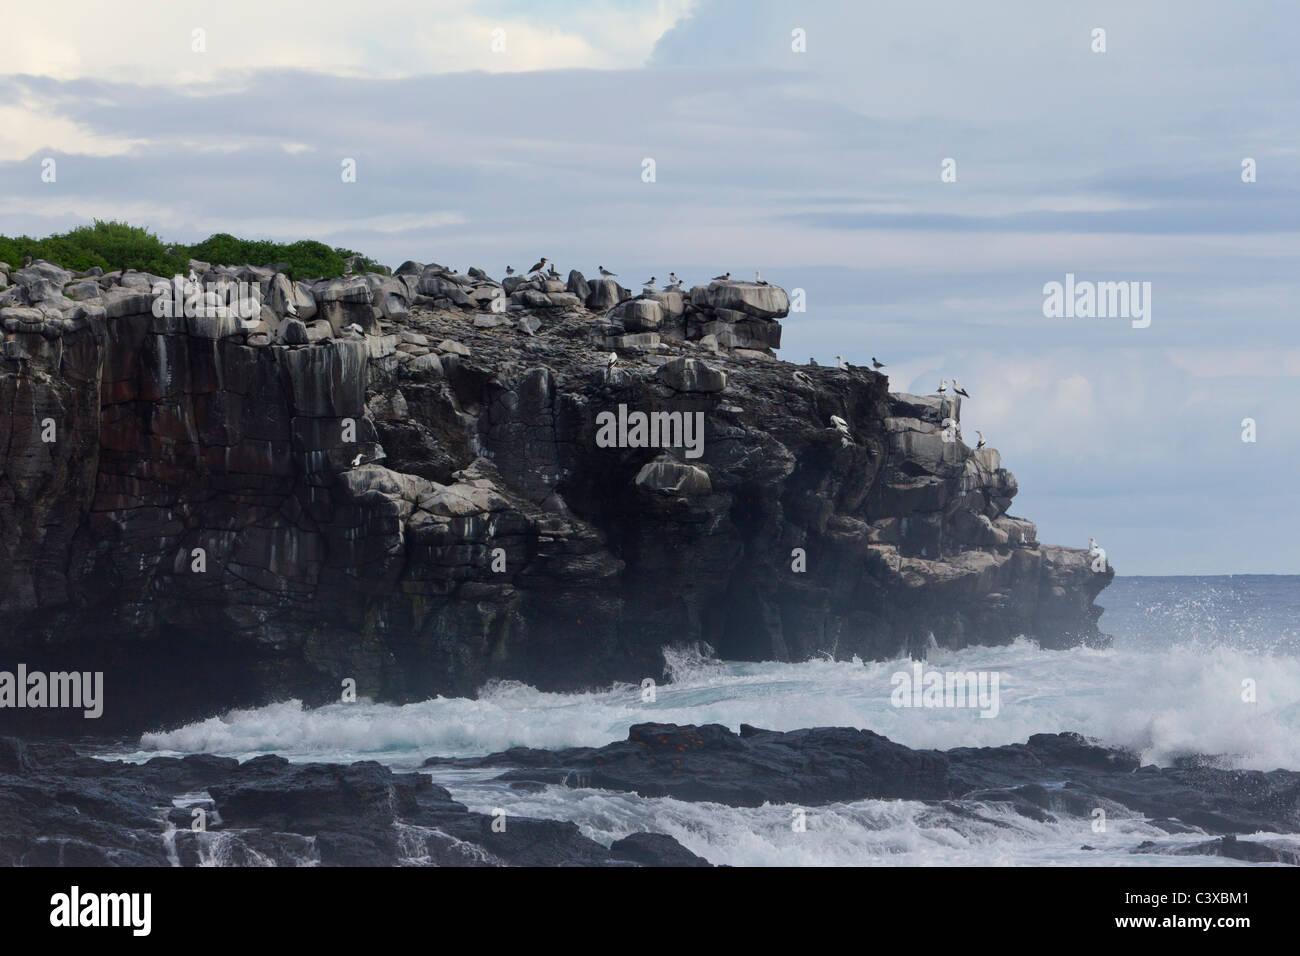 cliff with nesting seabirds, Punta Suarez, Espanola Island, Galapagos Islands, Ecuador - Stock Image